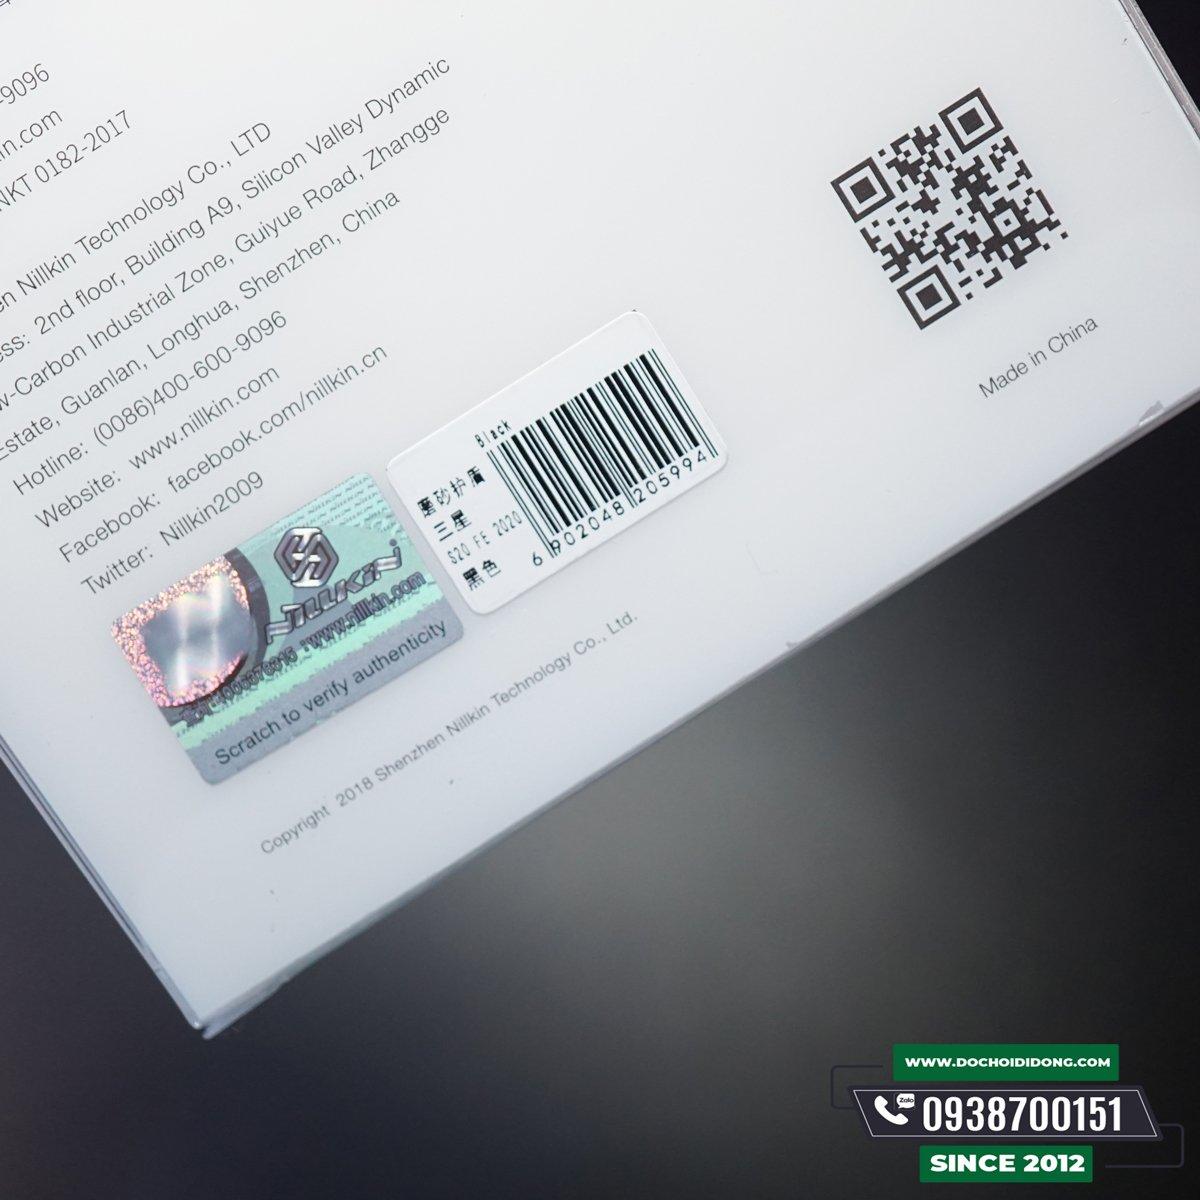 op-lung-samsung-s20-fe-2020-nillkin-van-san-tang-kem-gia-do